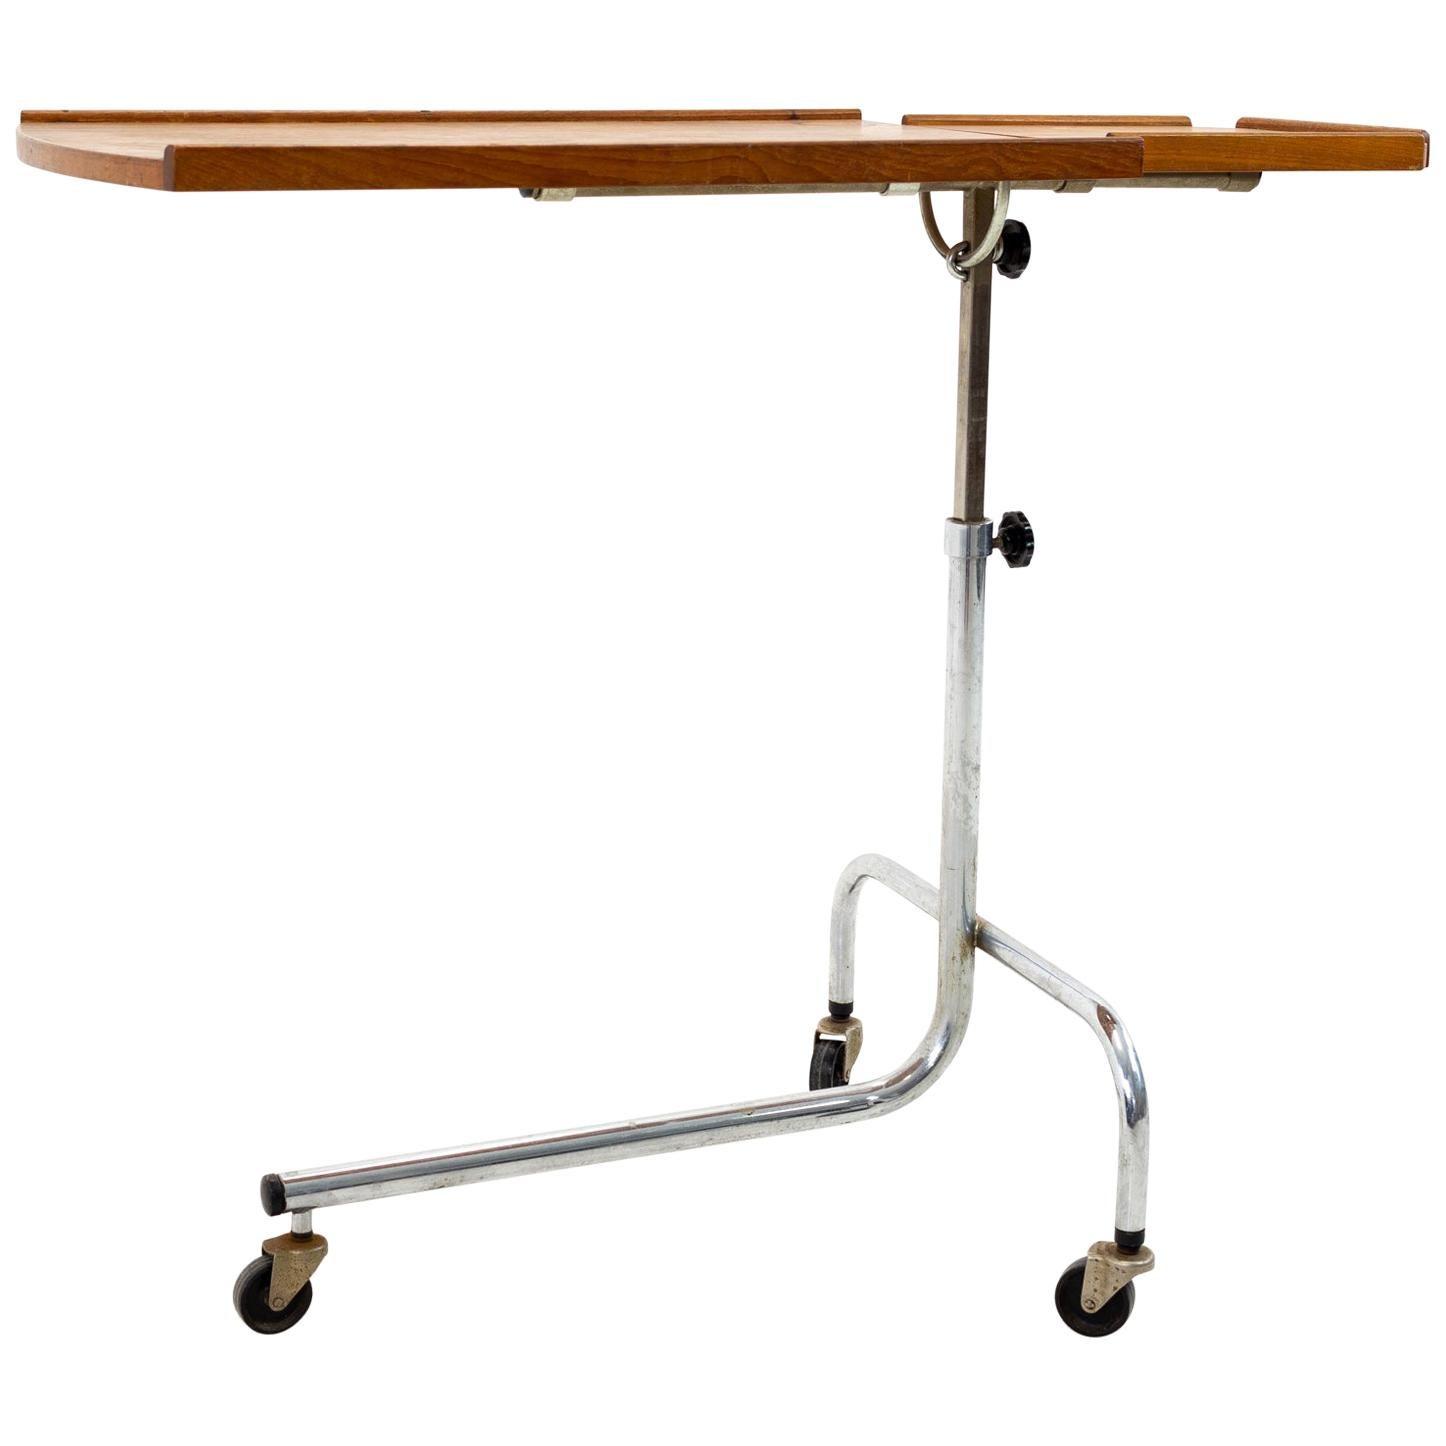 HMN Mid Century Danish Teak Adjustable Tray Table